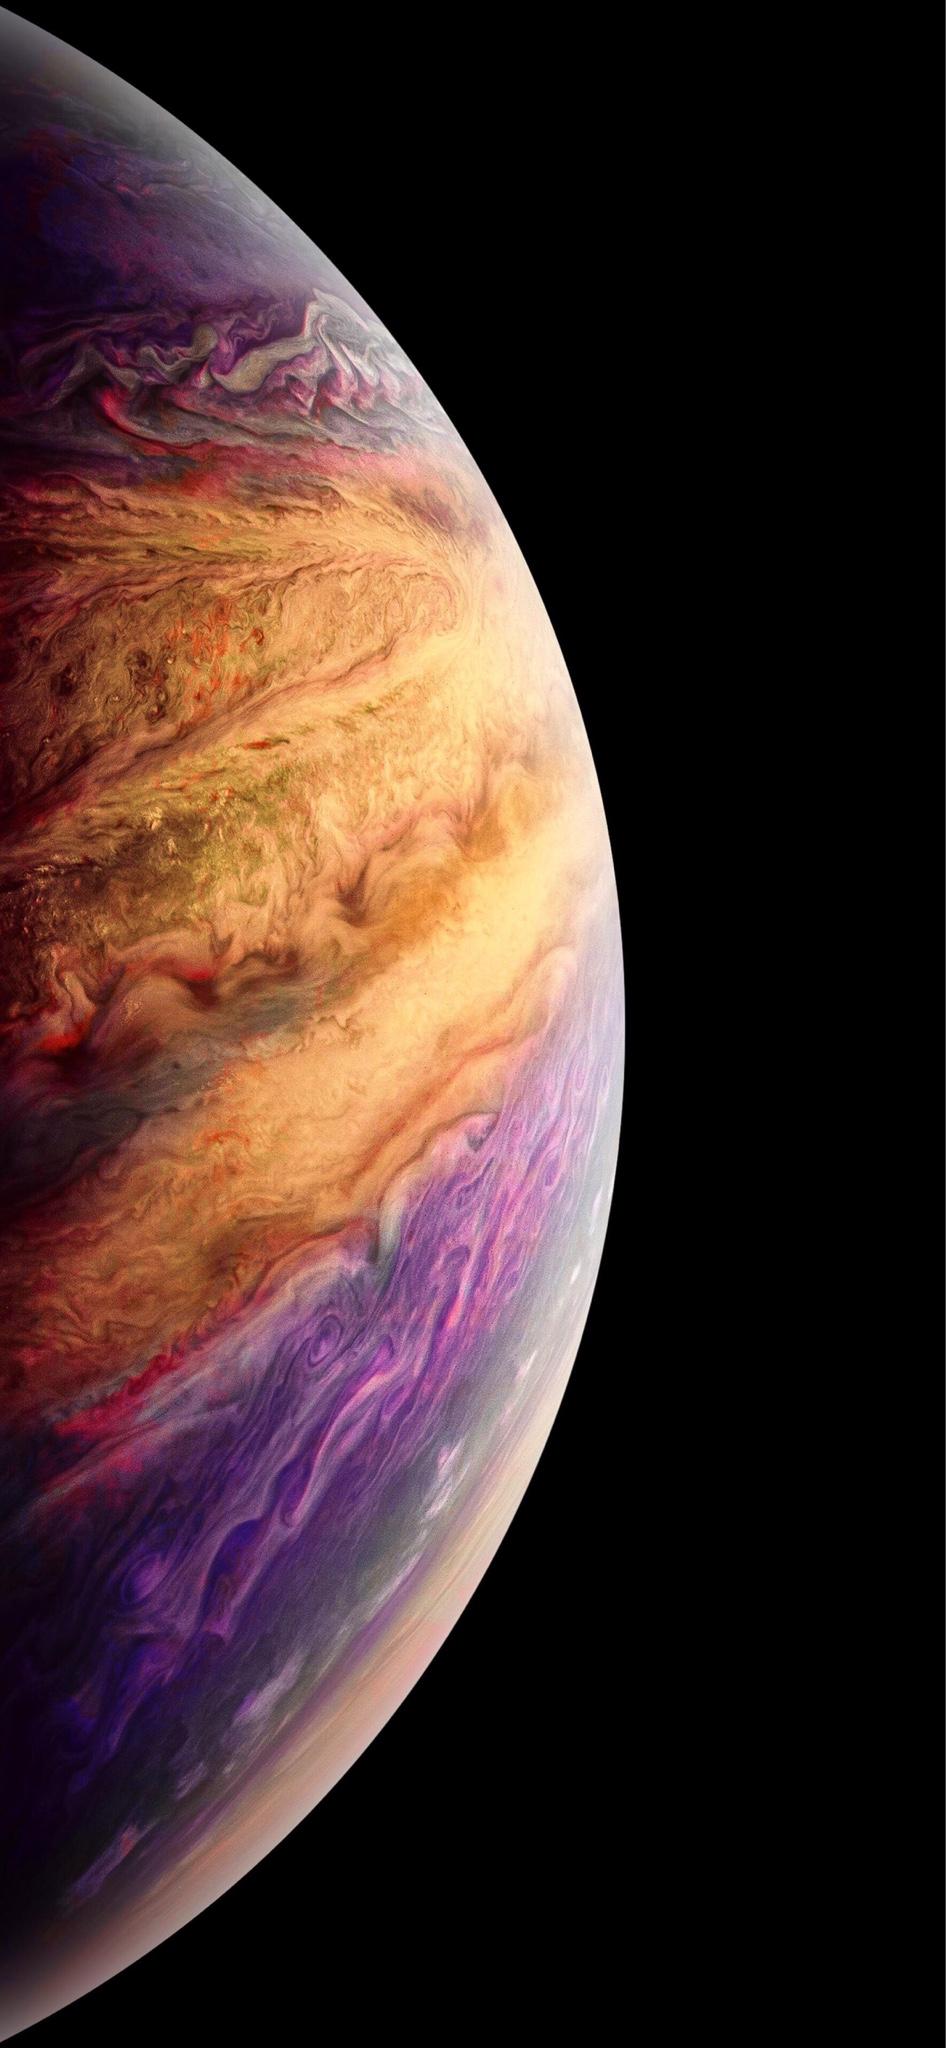 Iphone X Earth Wallpaper 4k